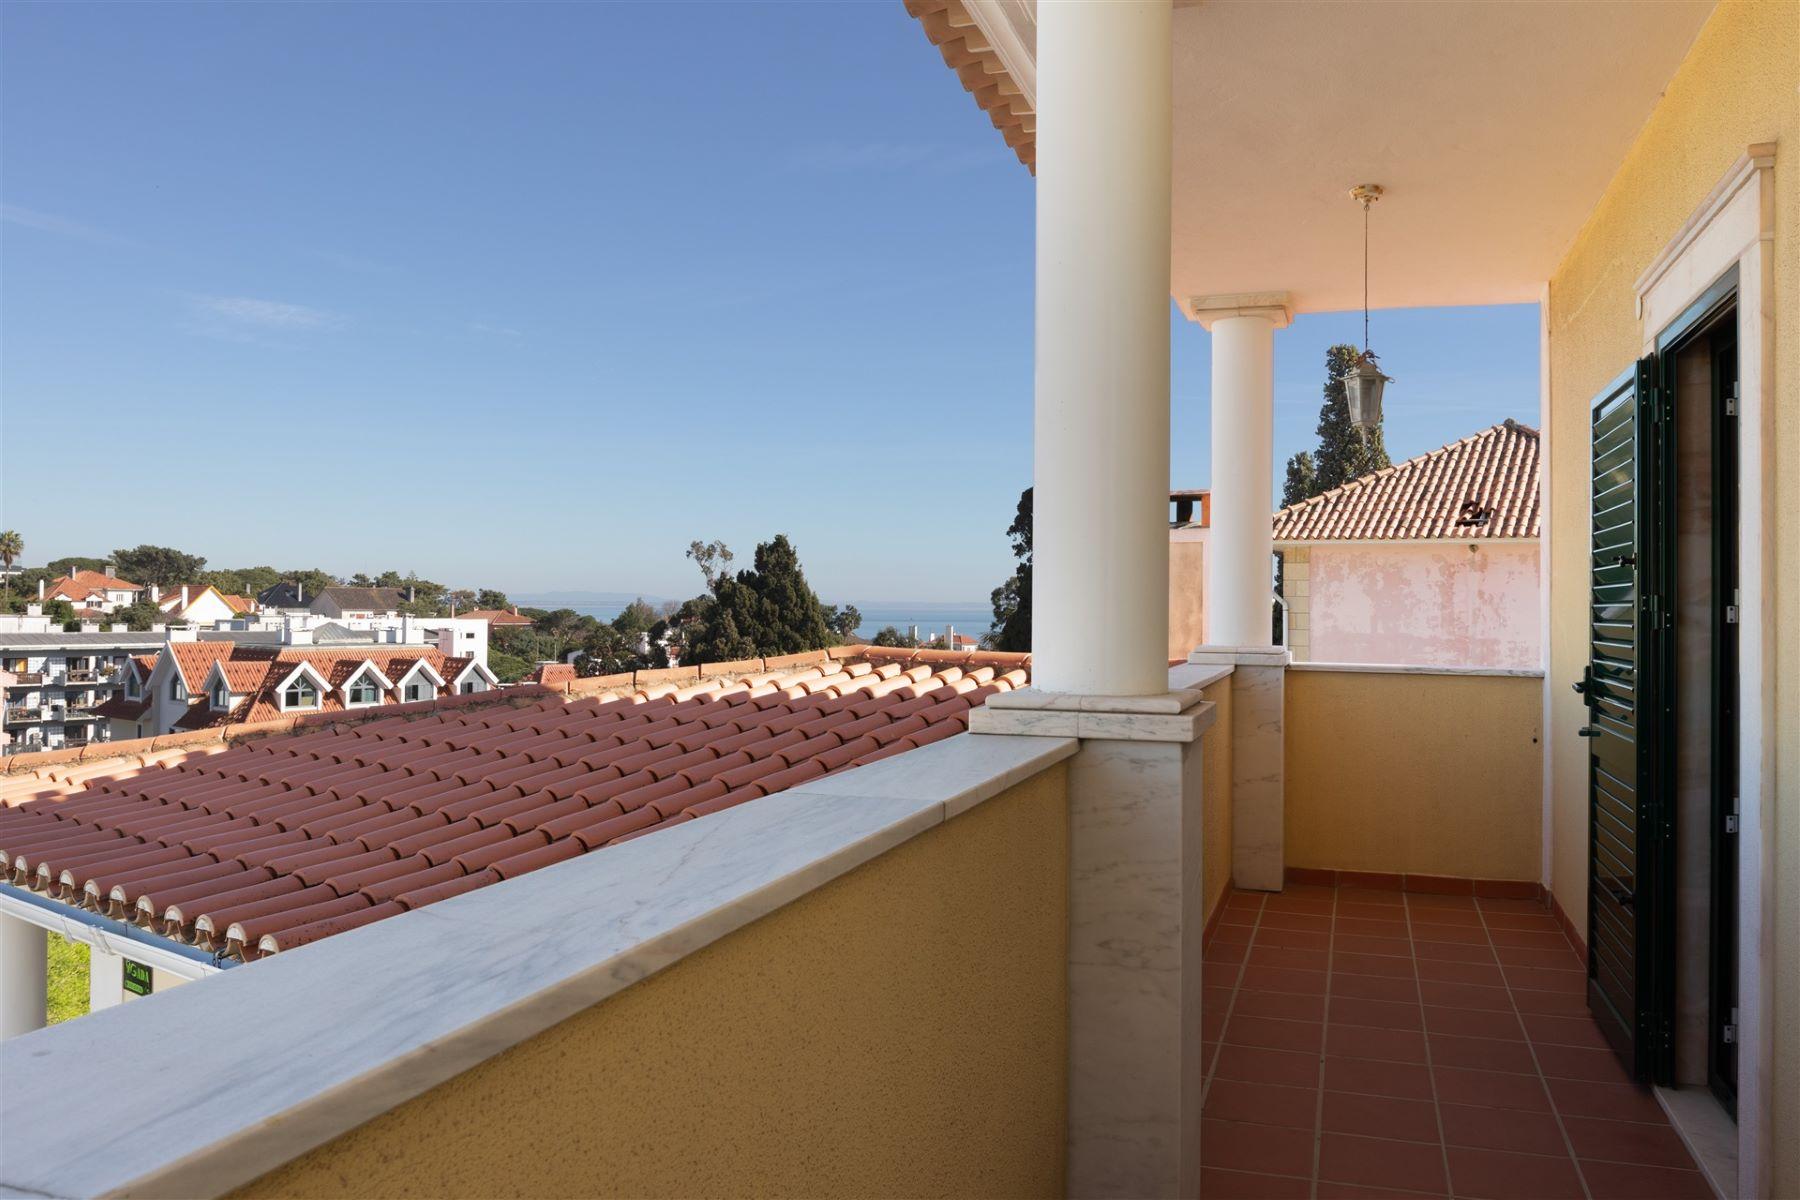 Single Family Homes for Sale at House, 6 bedrooms, for Sale Monte Estoril, Cascais, Lisboa Portugal